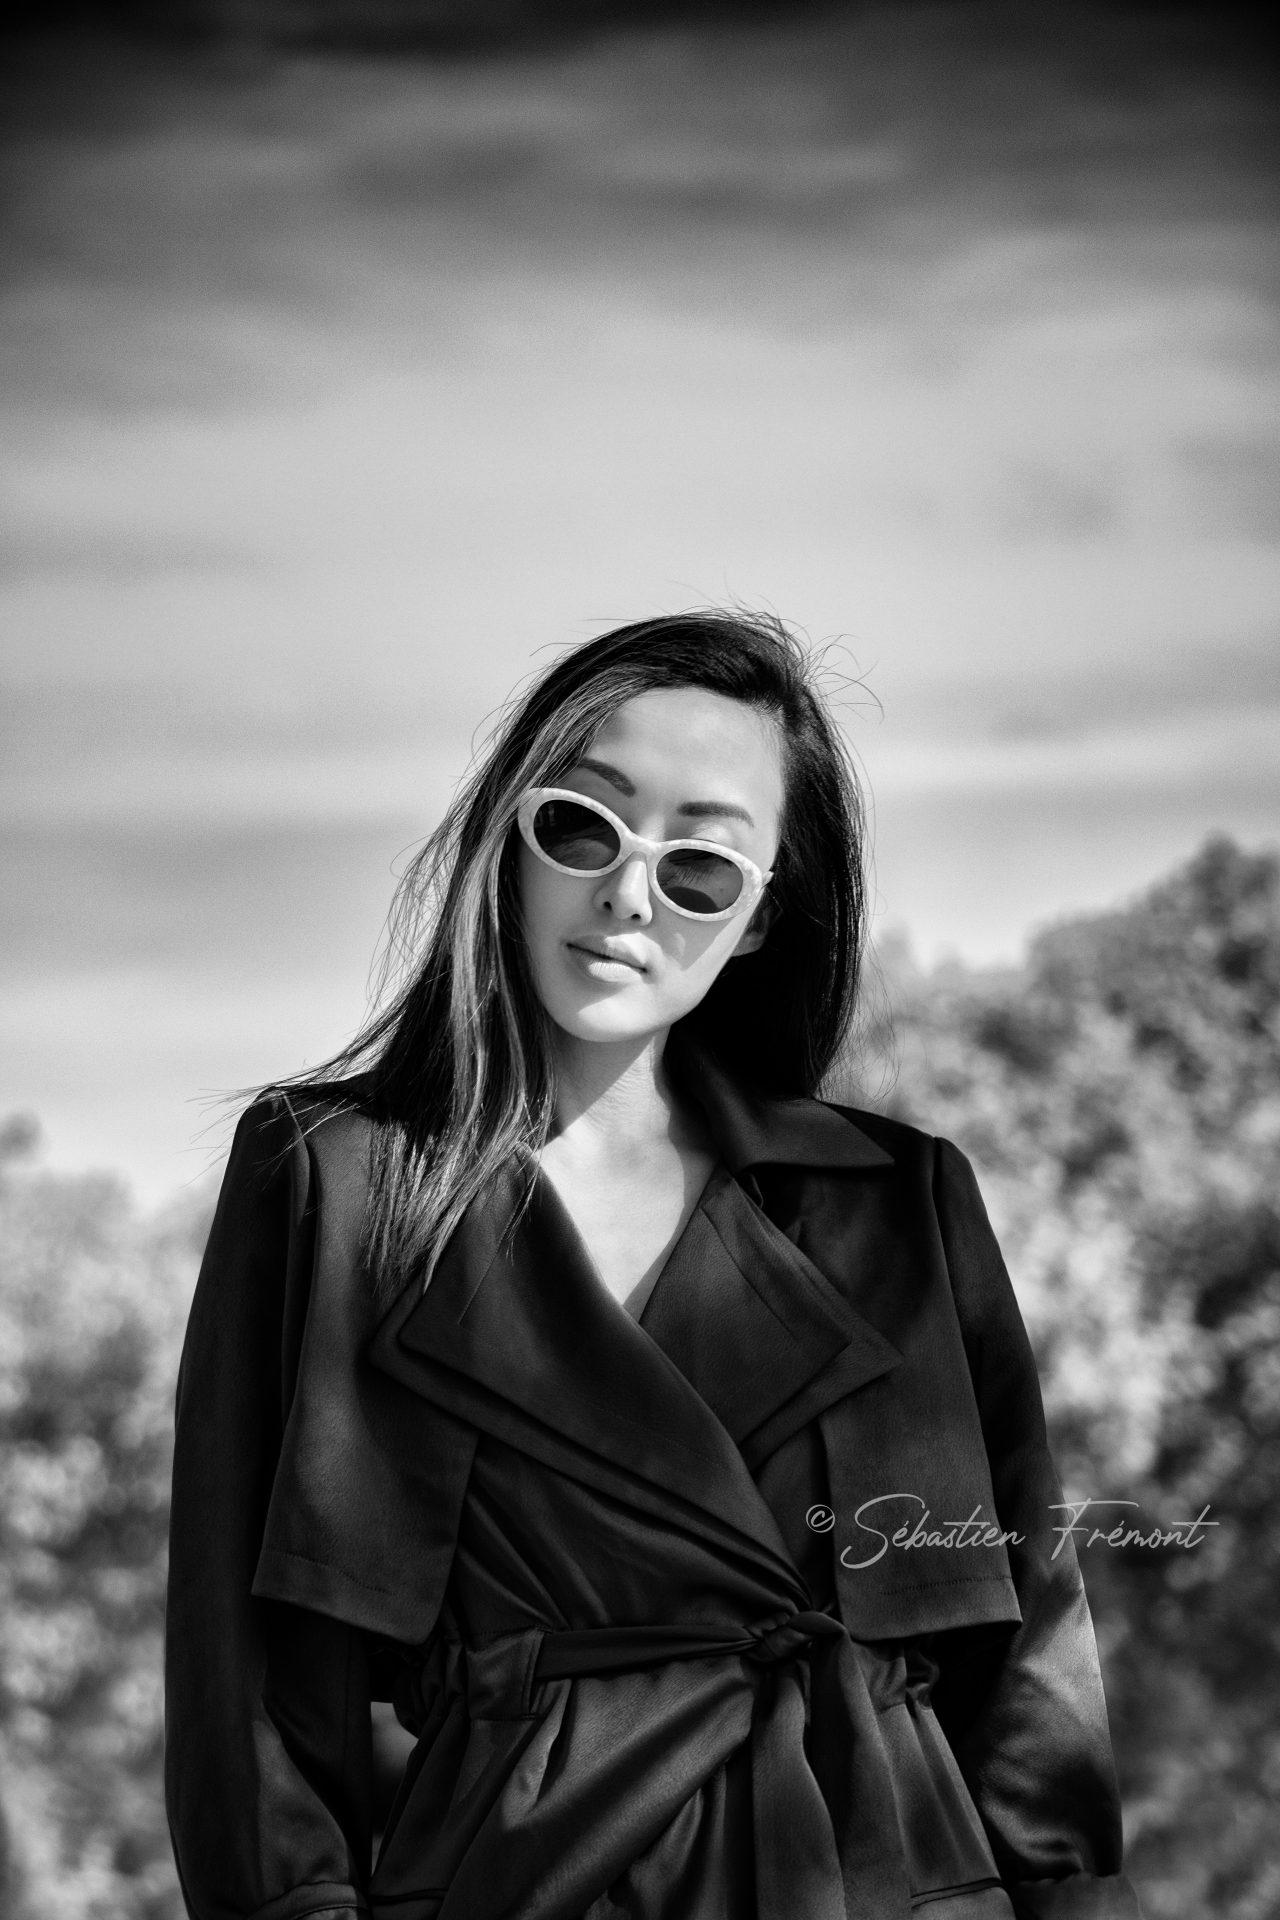 French Photographer Portrait Photography Chriselle Lim / Nina Ricci